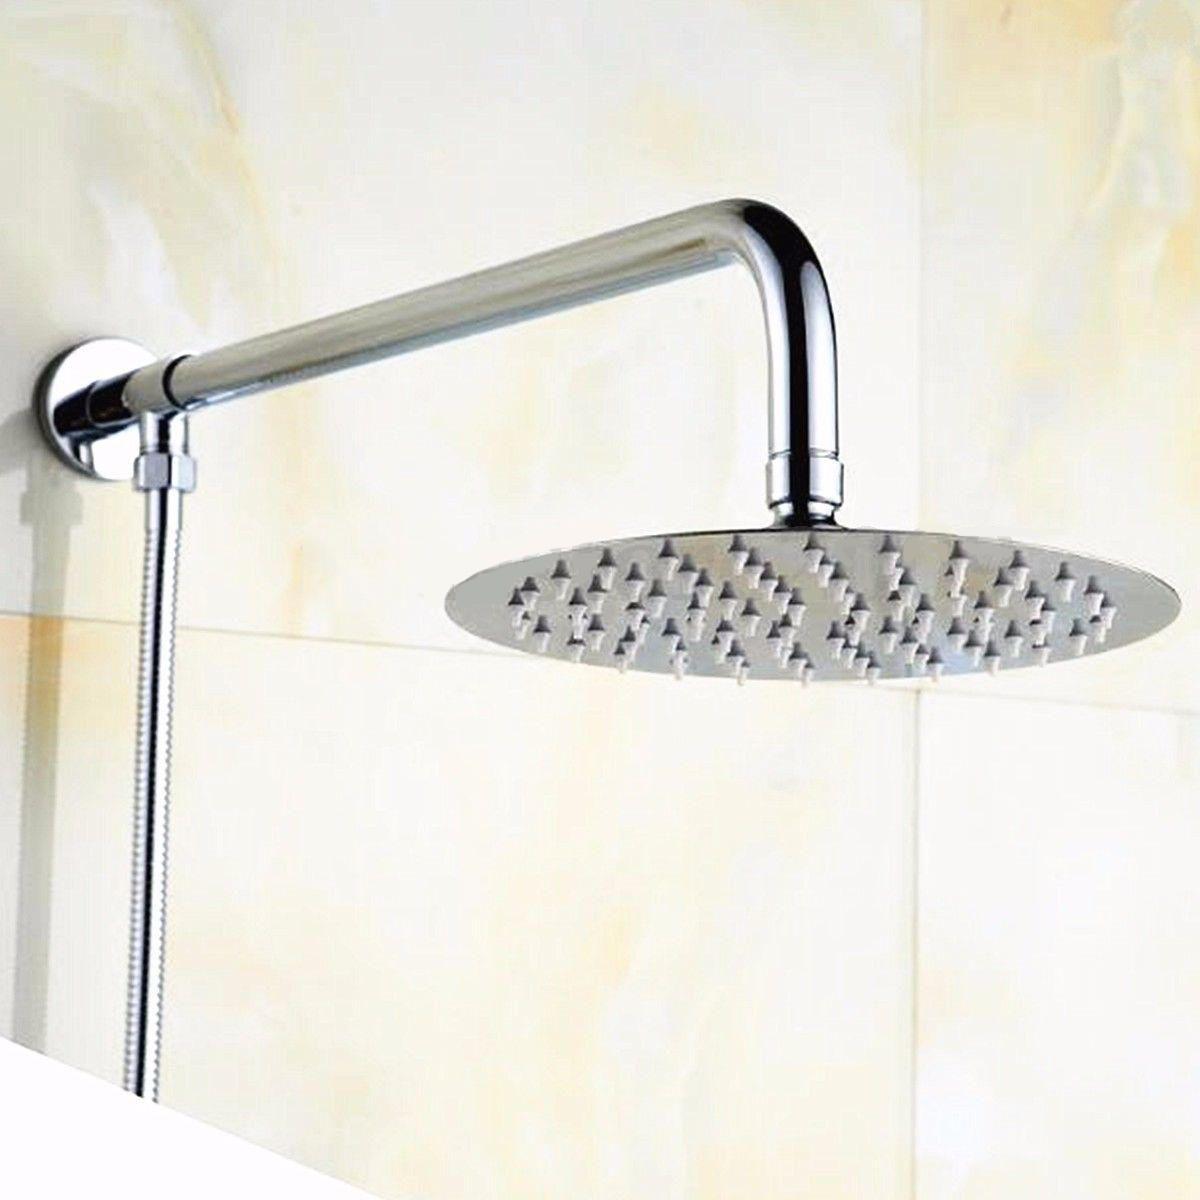 2018 Mayitr Round Rain Shower Head Thin Stainless Steel Rainfall Shower Head  Bathroom Top Sprayer 10inch New From Williem, $36.39 | Dhgate.Com